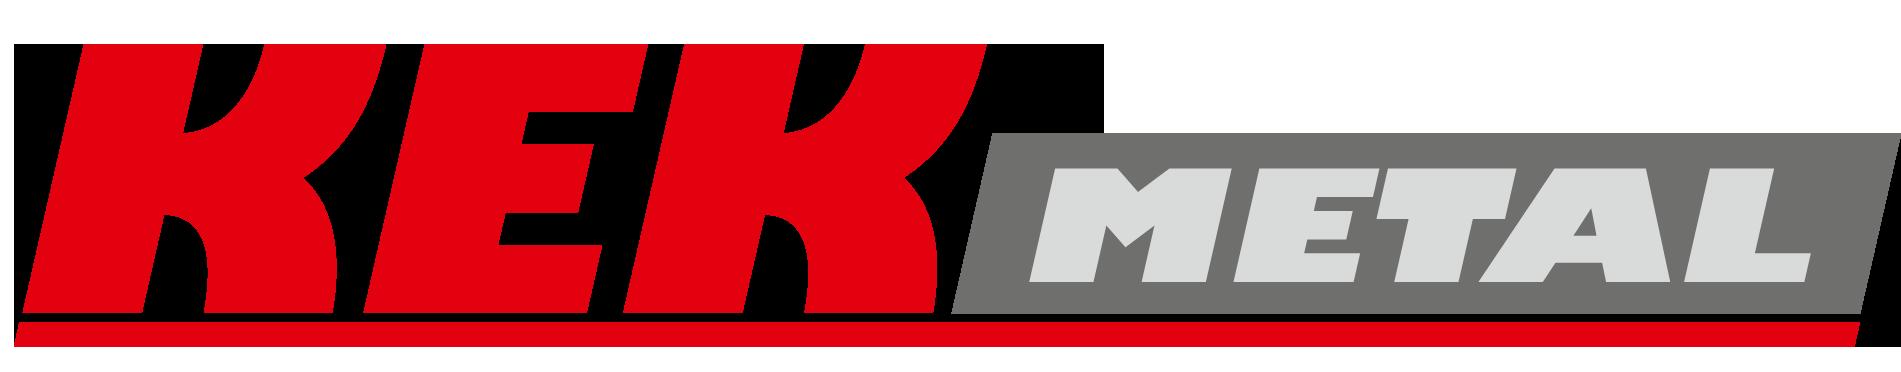 KekMetal